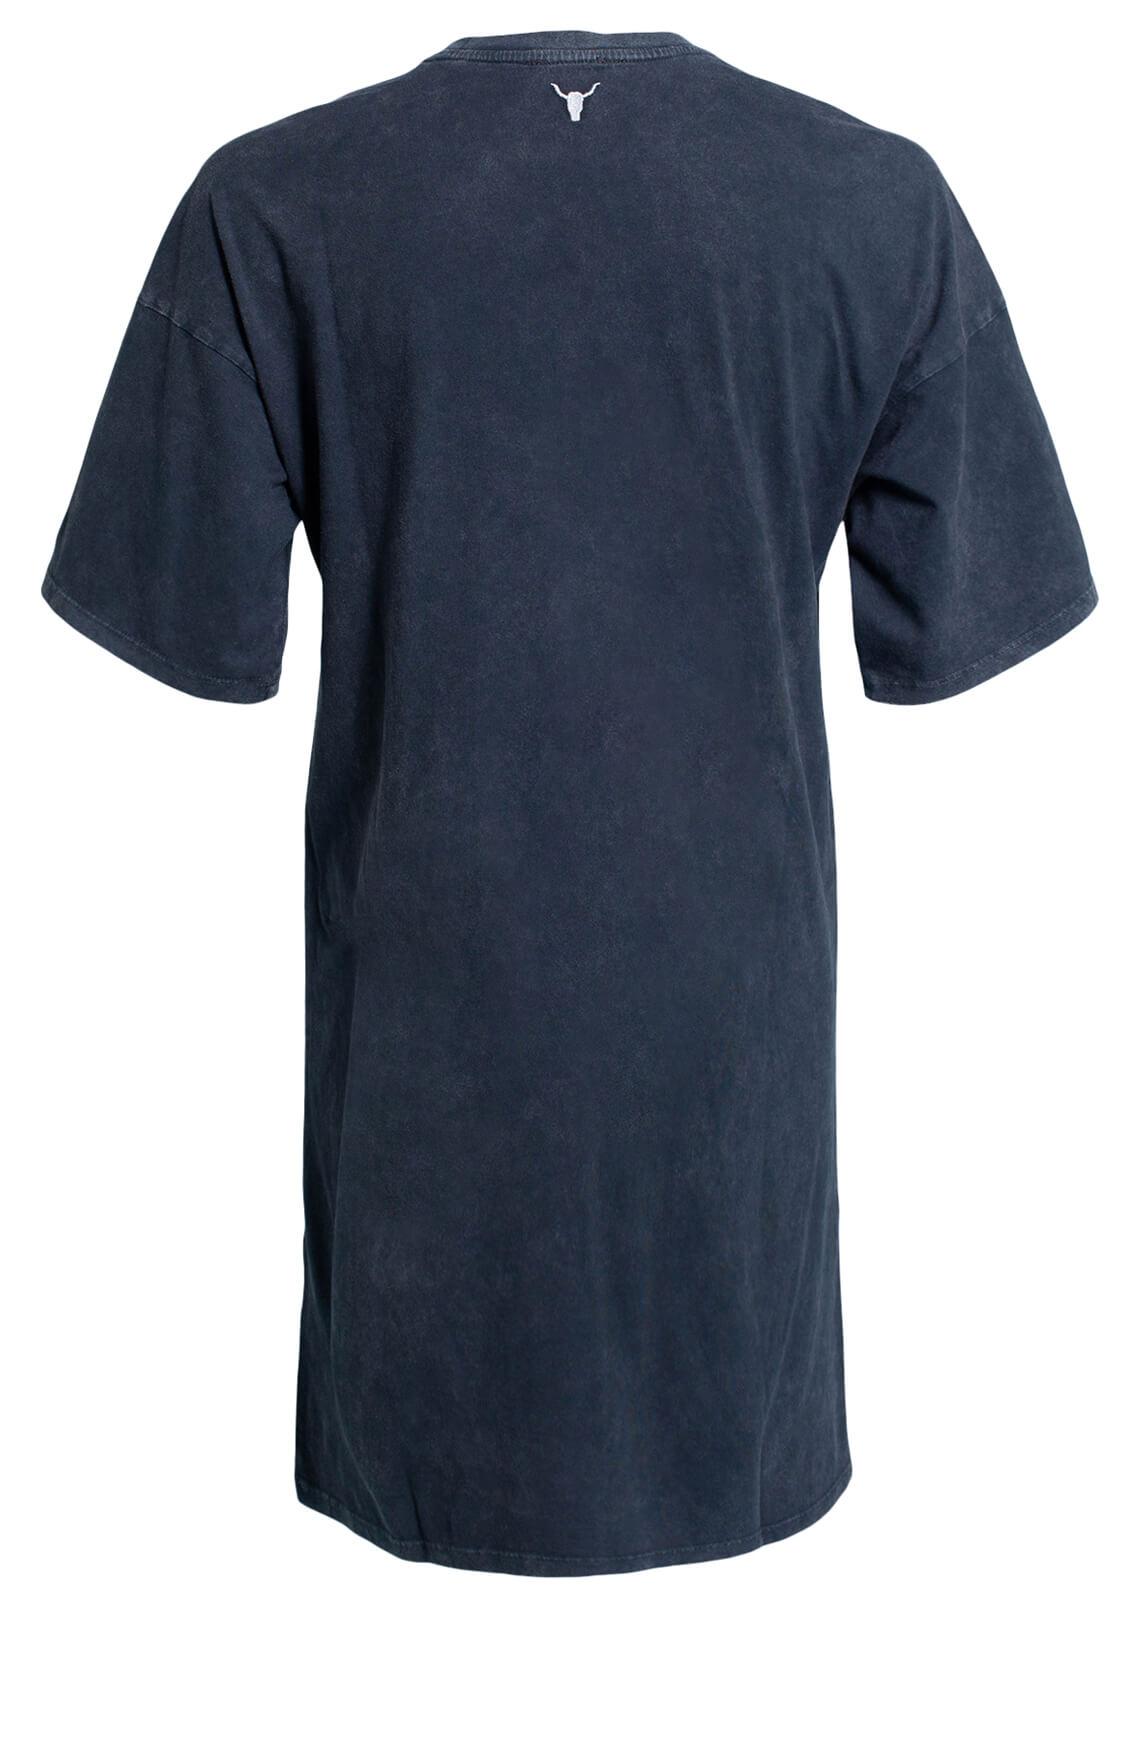 Alix The Label Dames Oversized lang shirt zwart